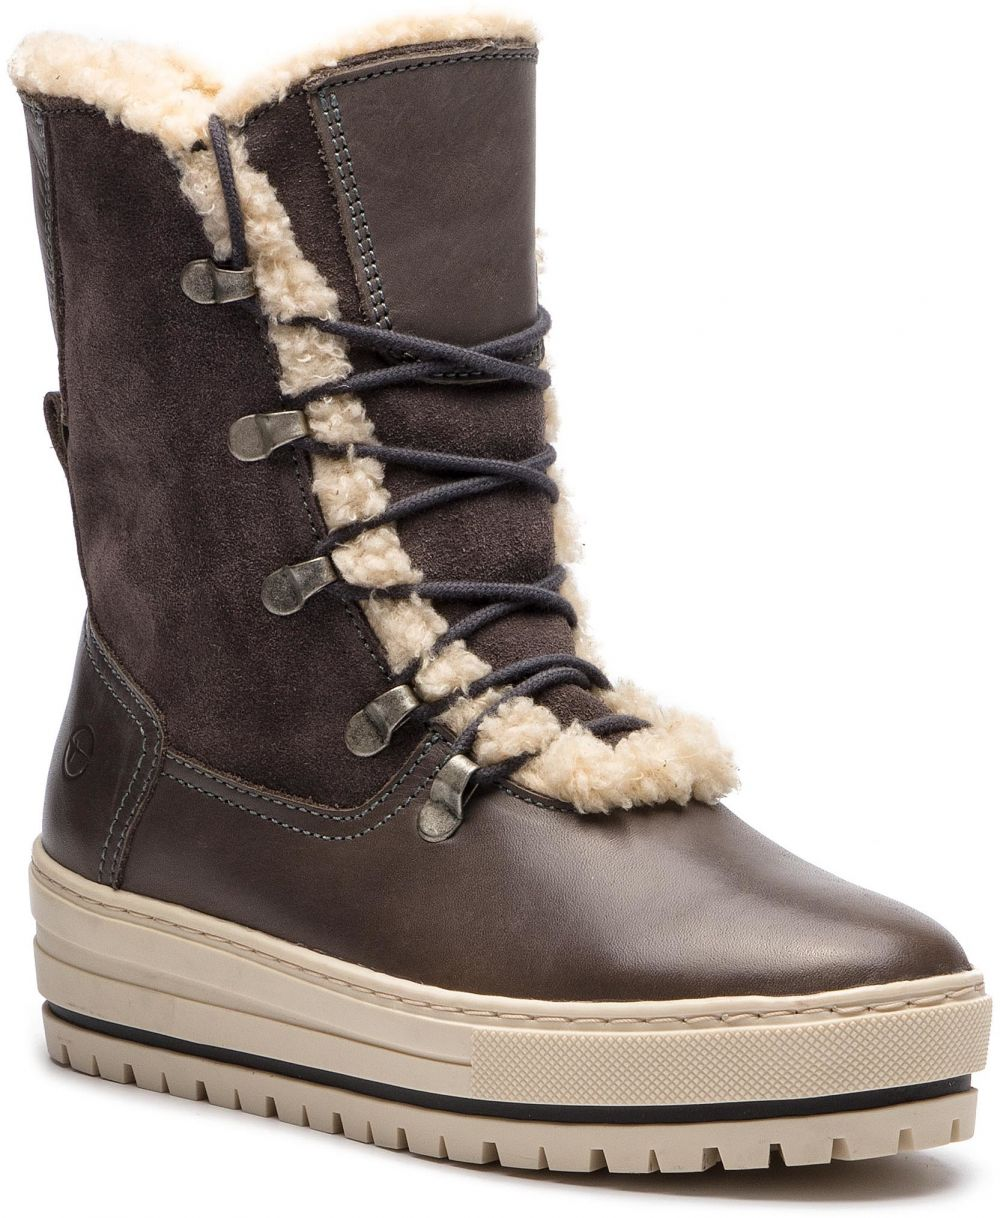 Členková obuv TAMARIS - 1-26077-31 Anthracite 214 značky Tamaris - Lovely.sk b9040225f53